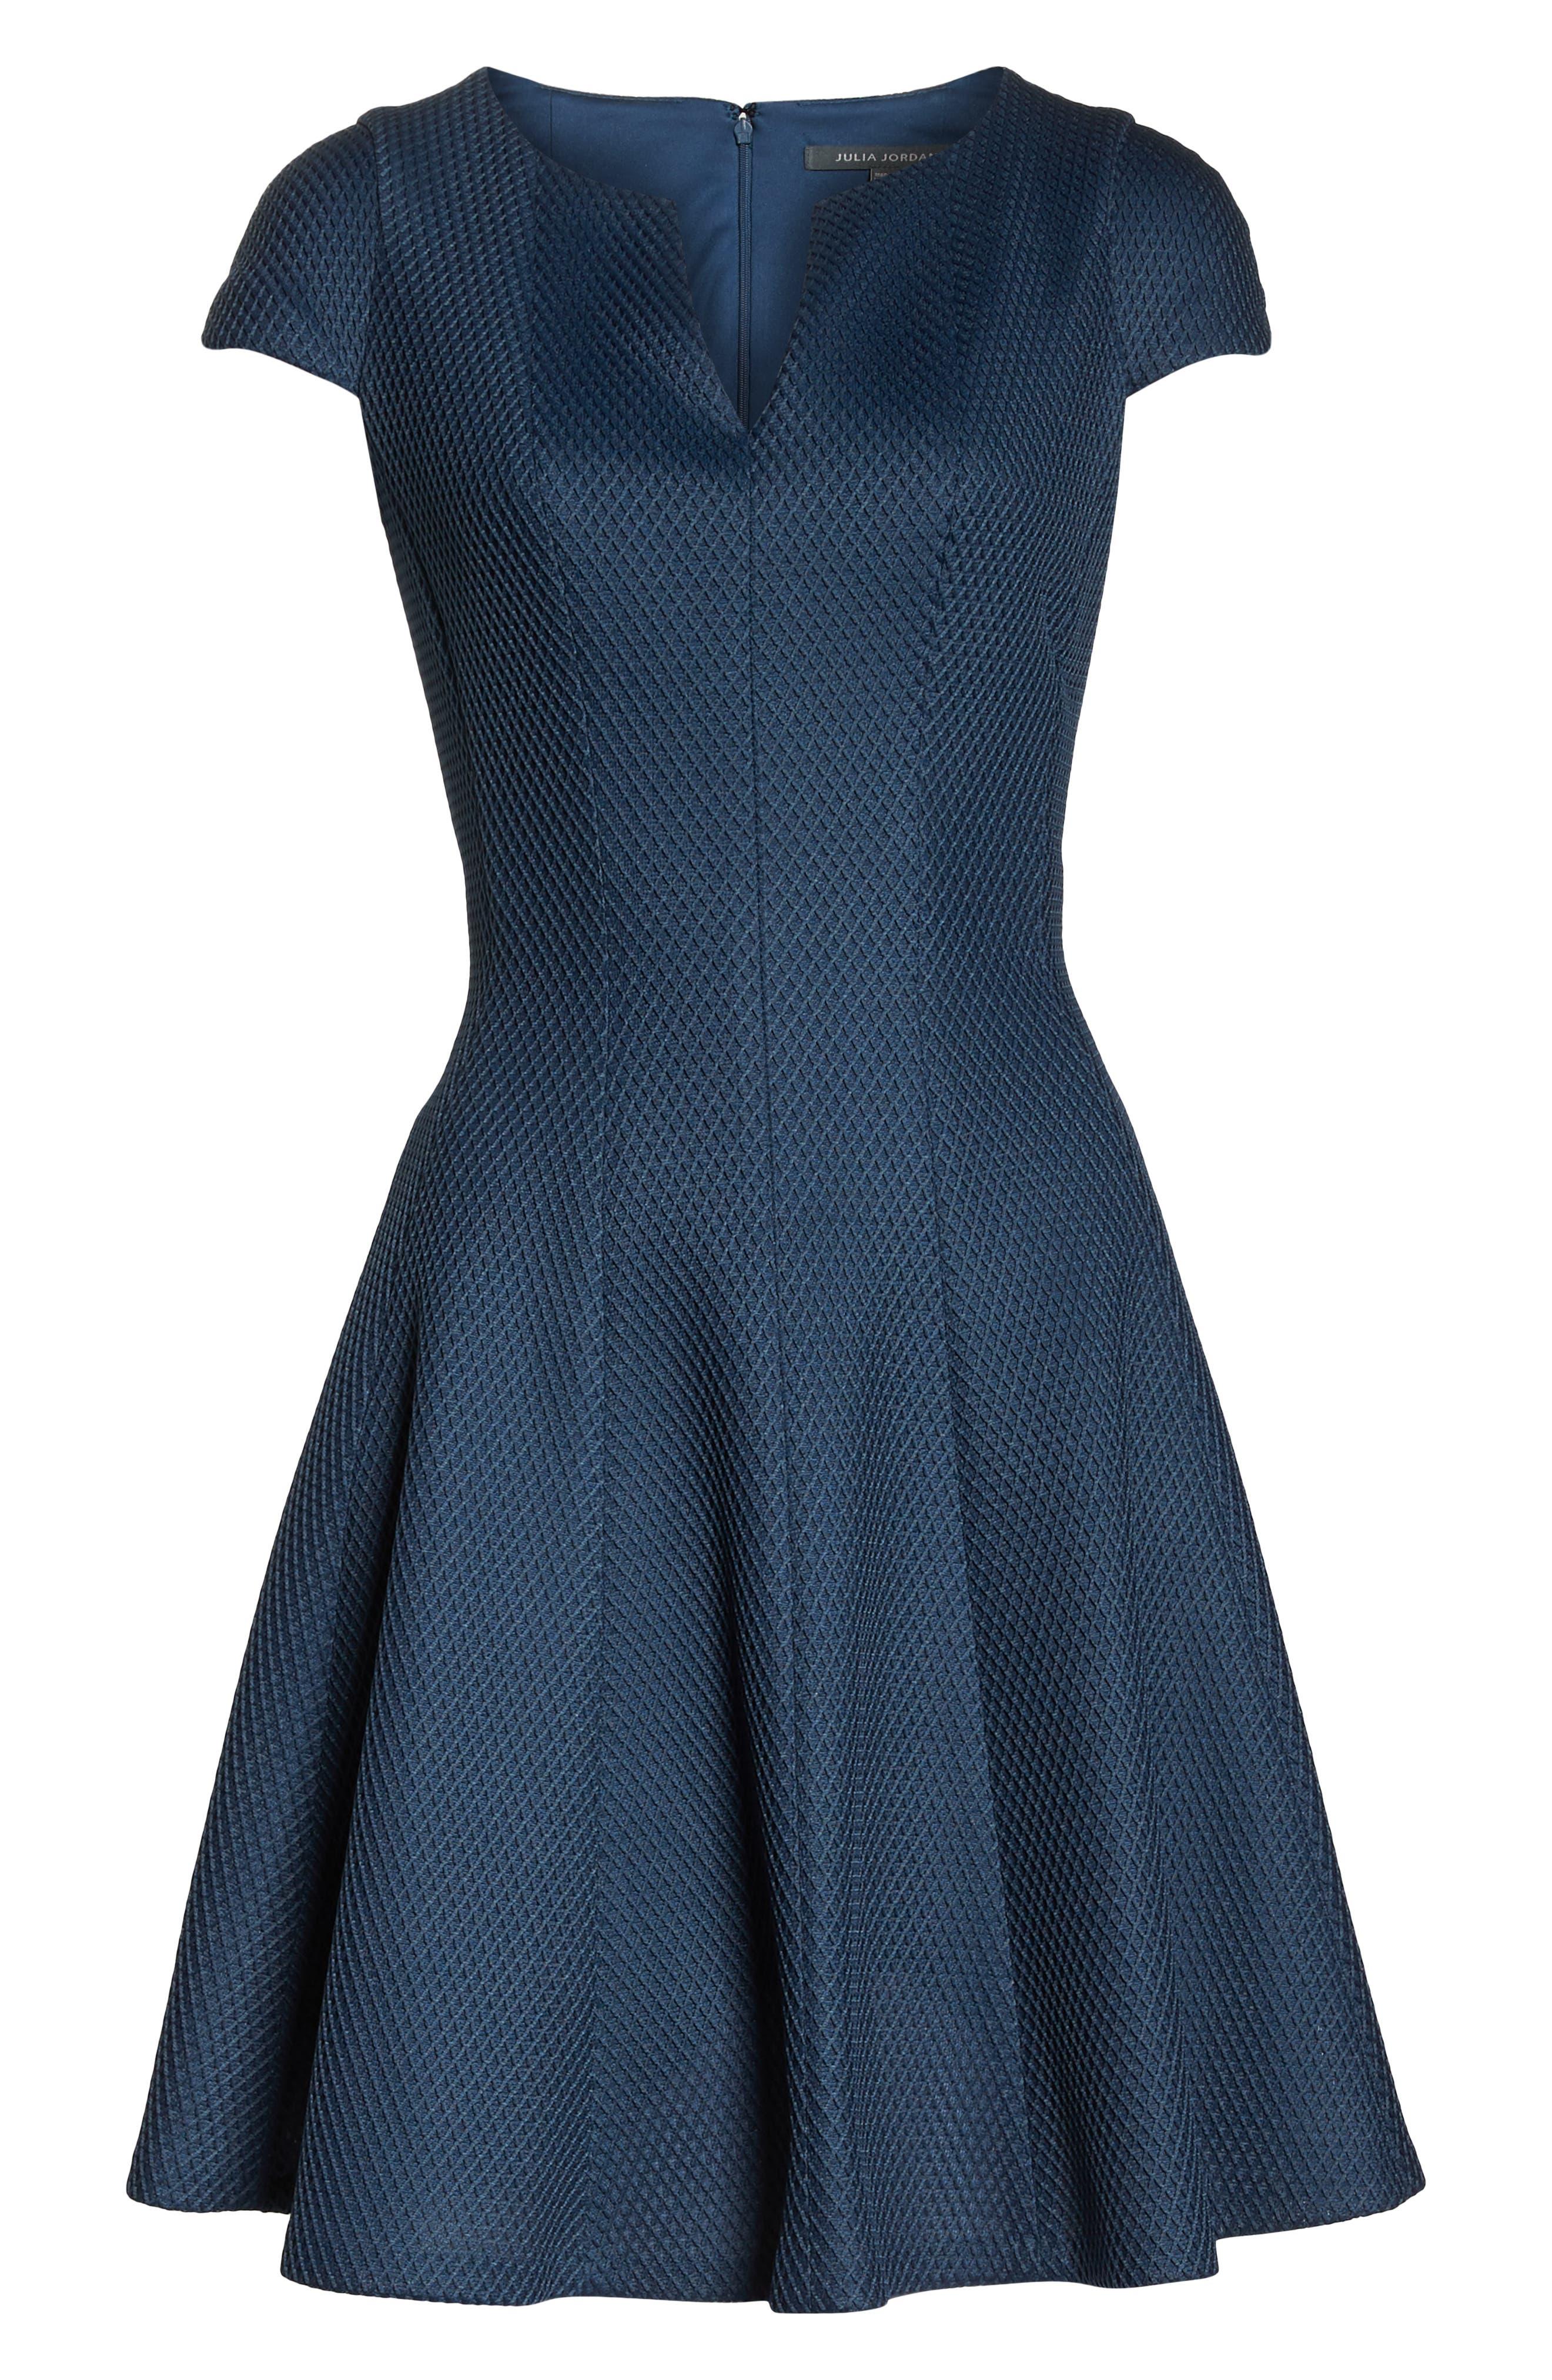 JULIA JORDAN, Fit & Flare Dress, Alternate thumbnail 7, color, 445